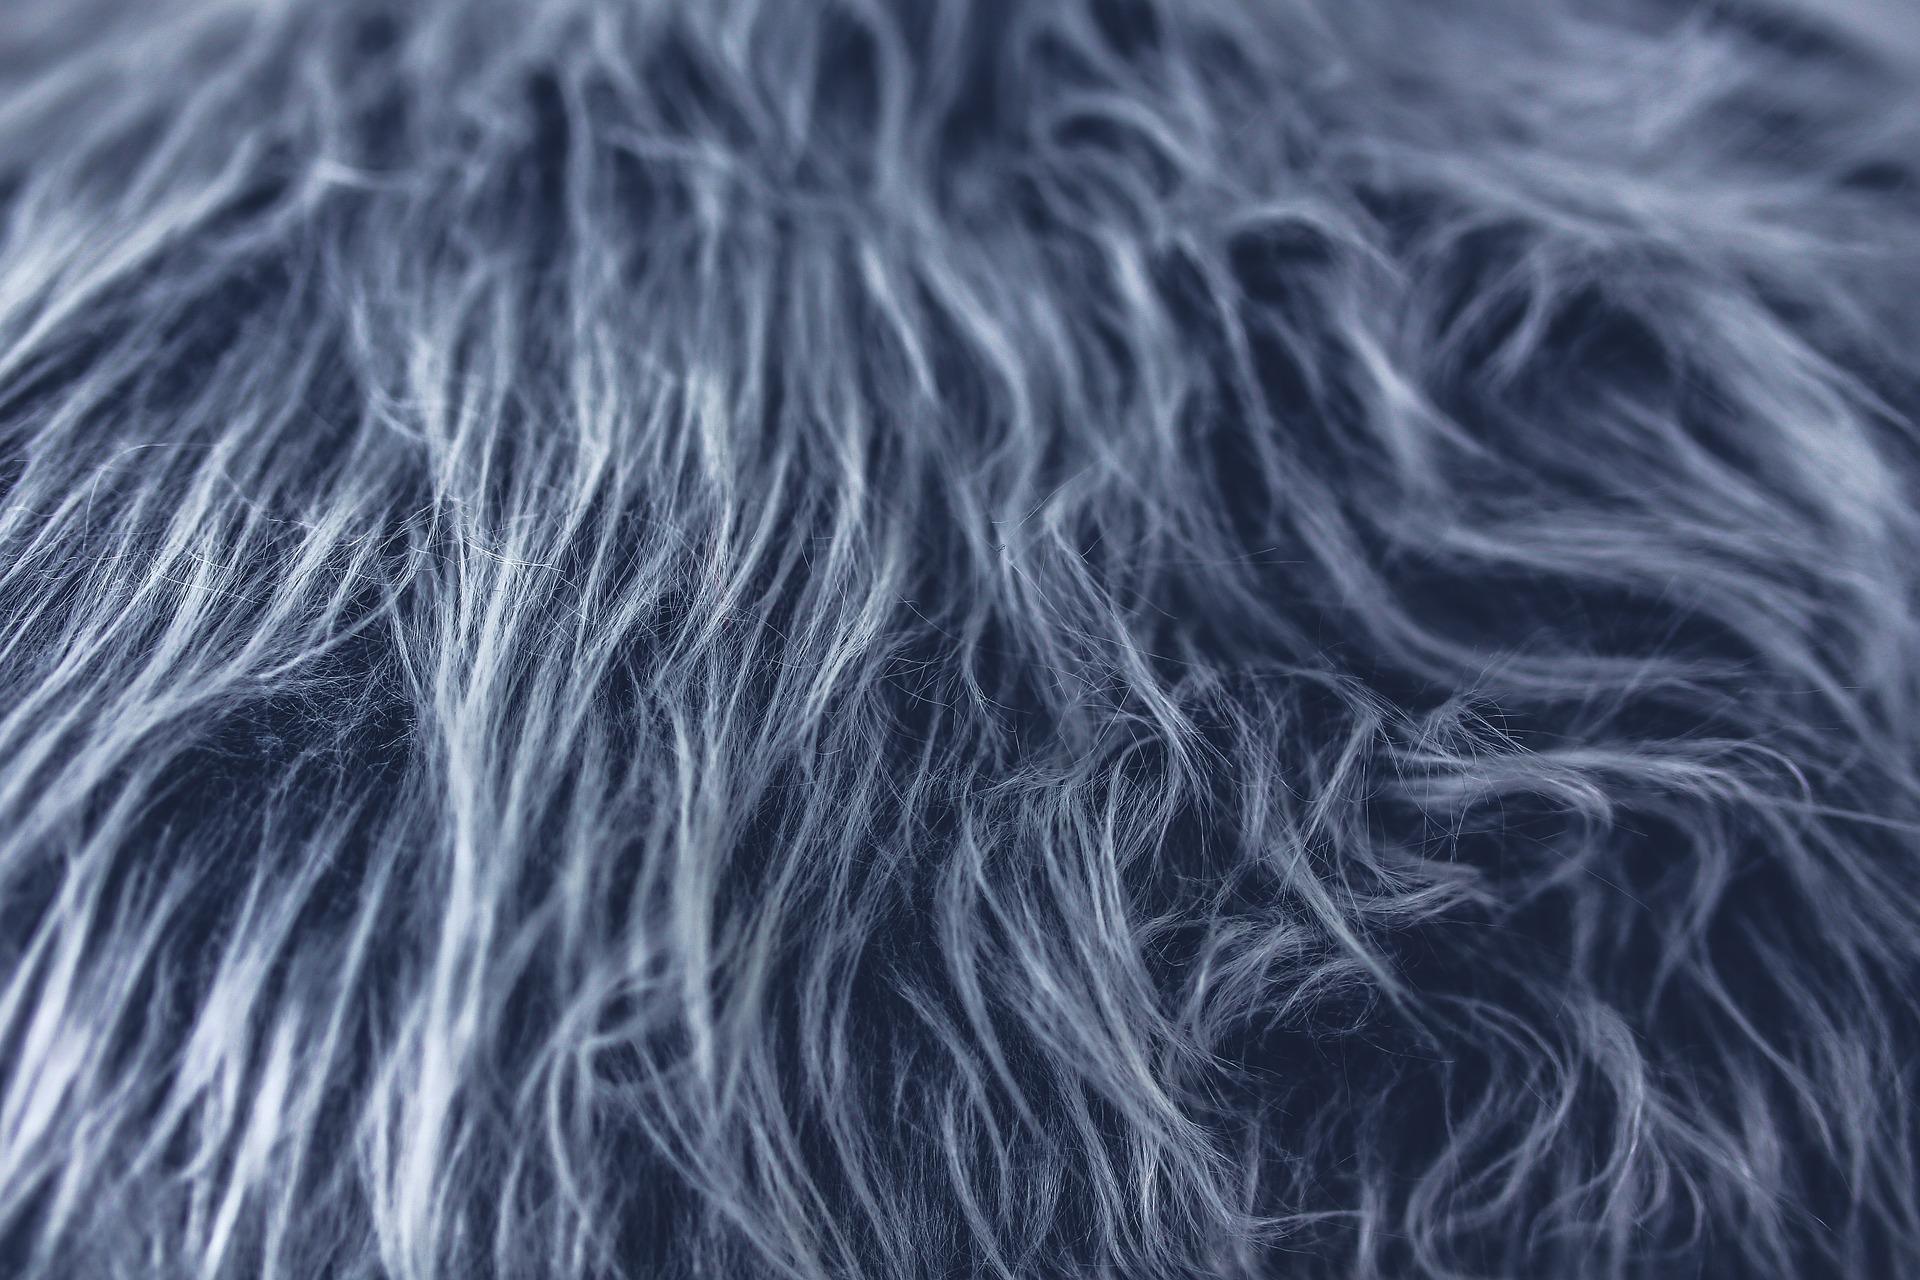 Image: Fur via Pixabay